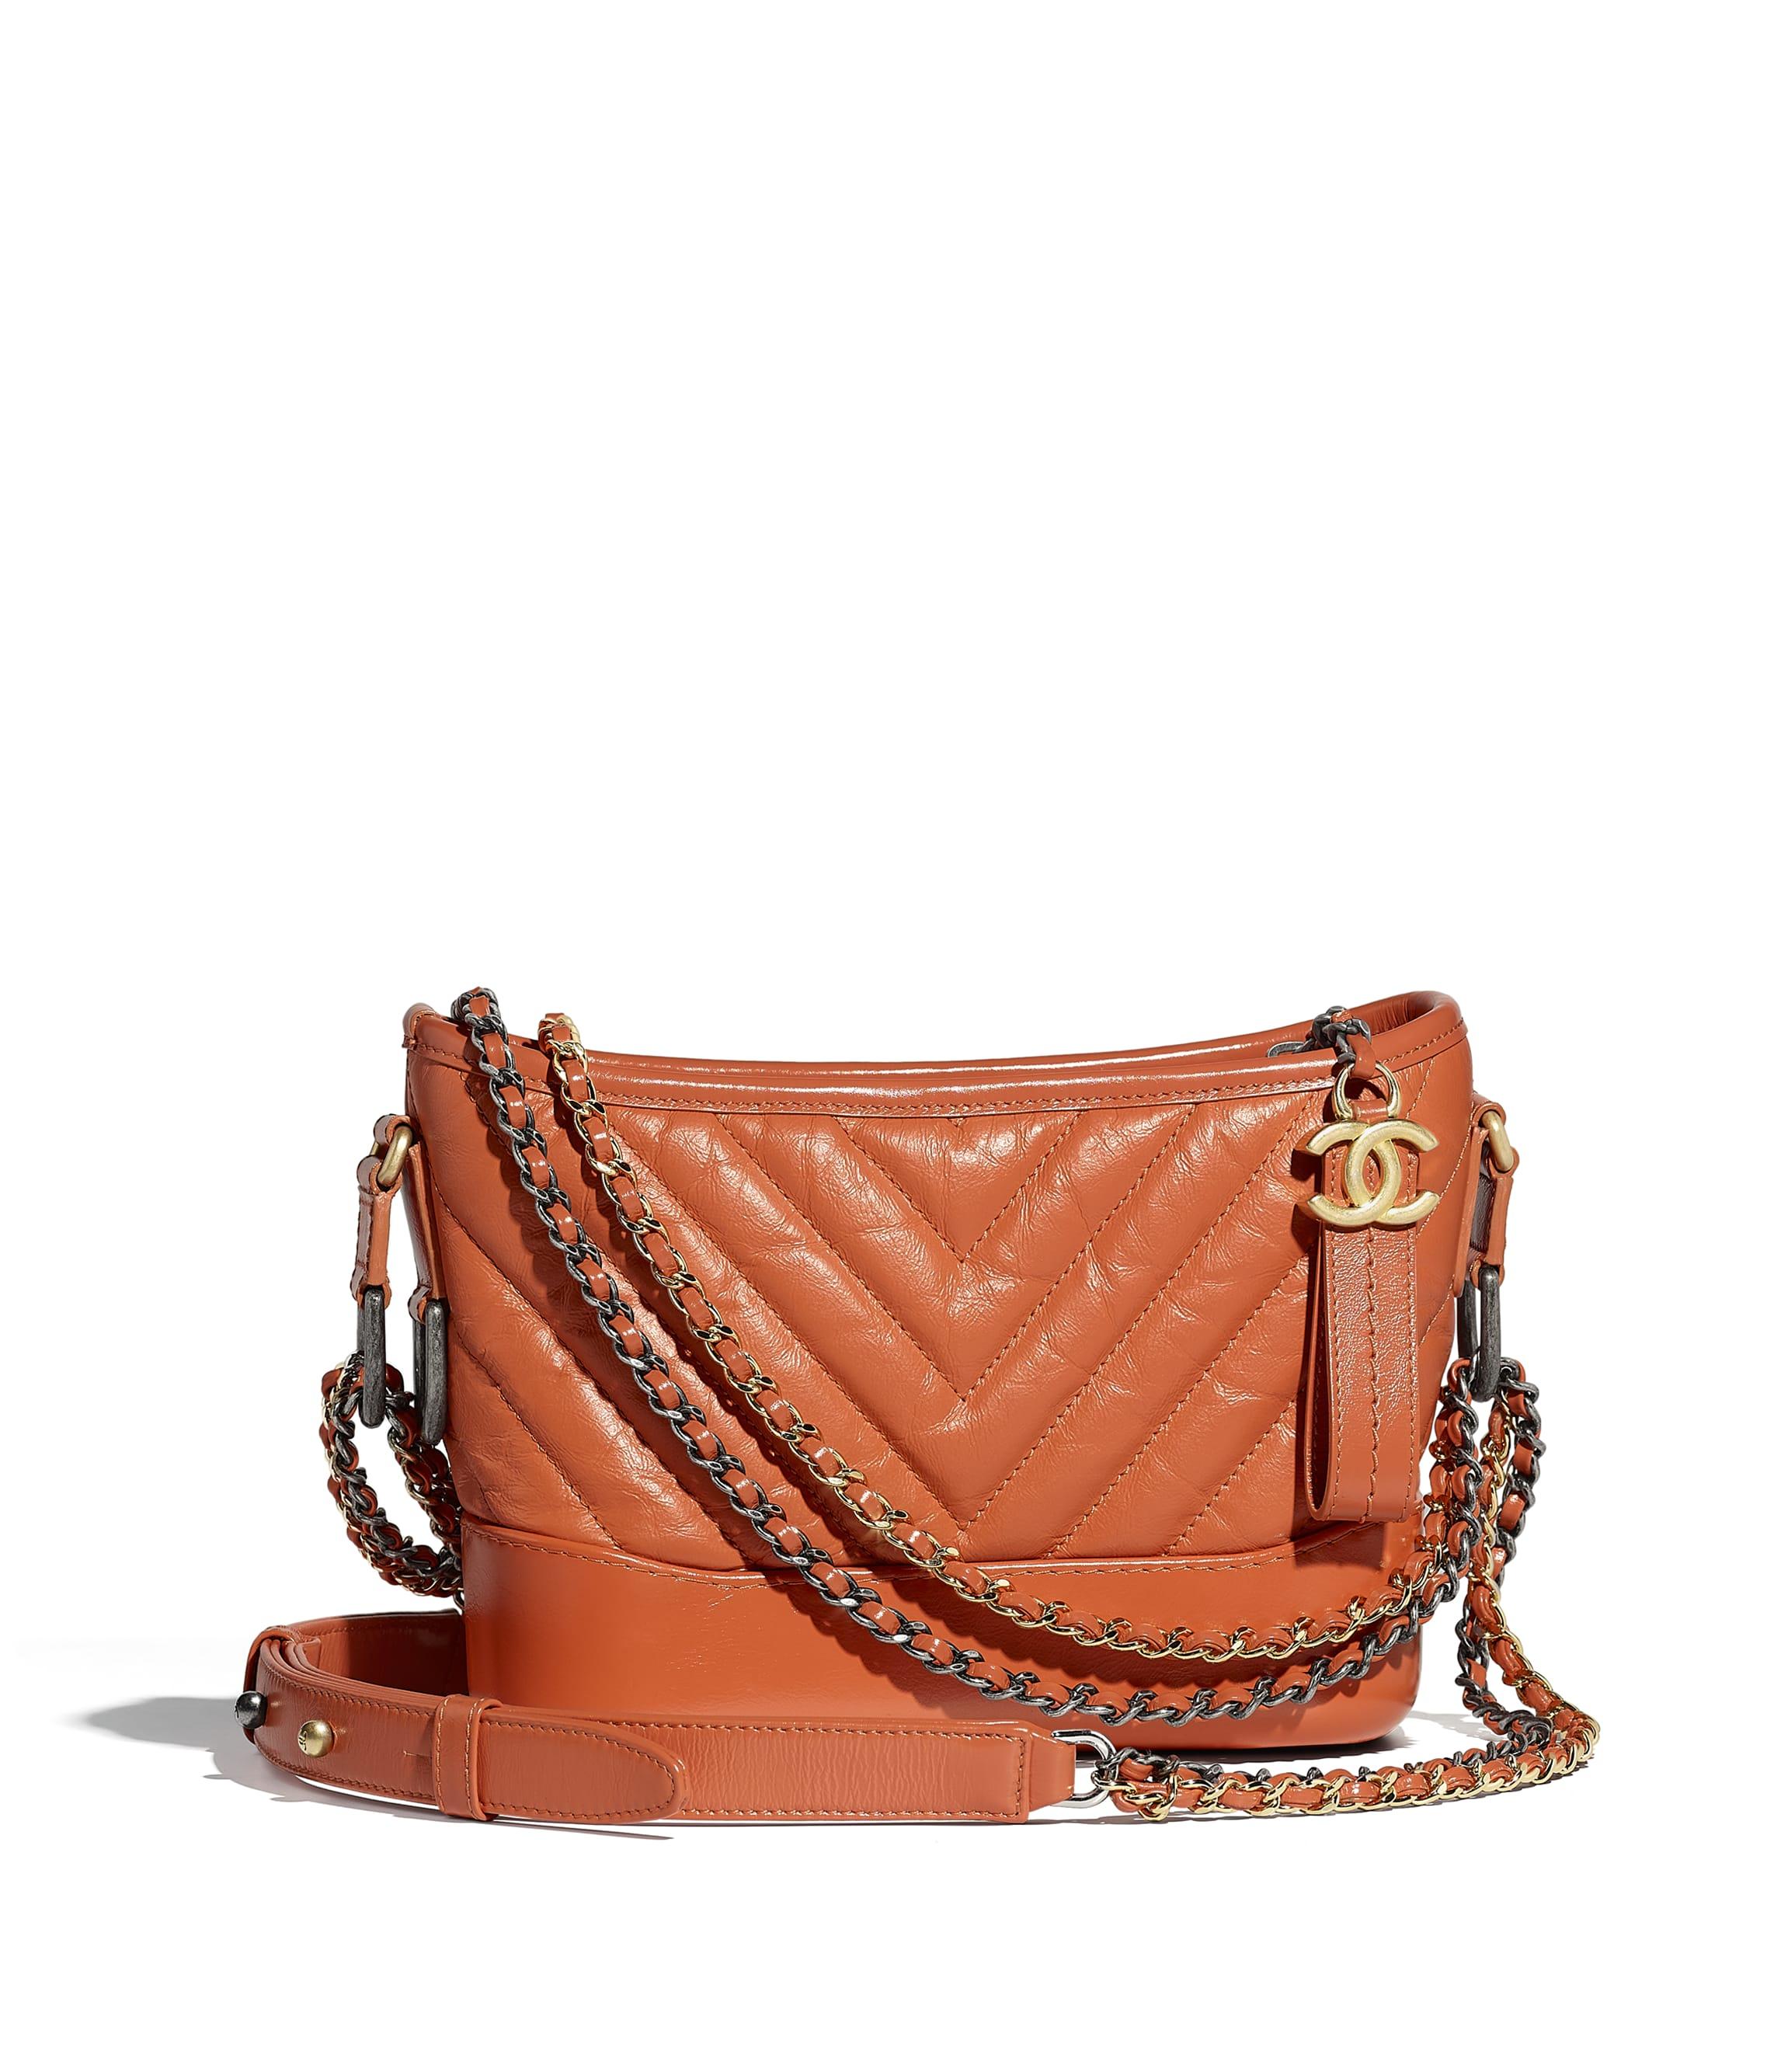 CHANEL'S GABRIELLE сумка hobo маленького размера